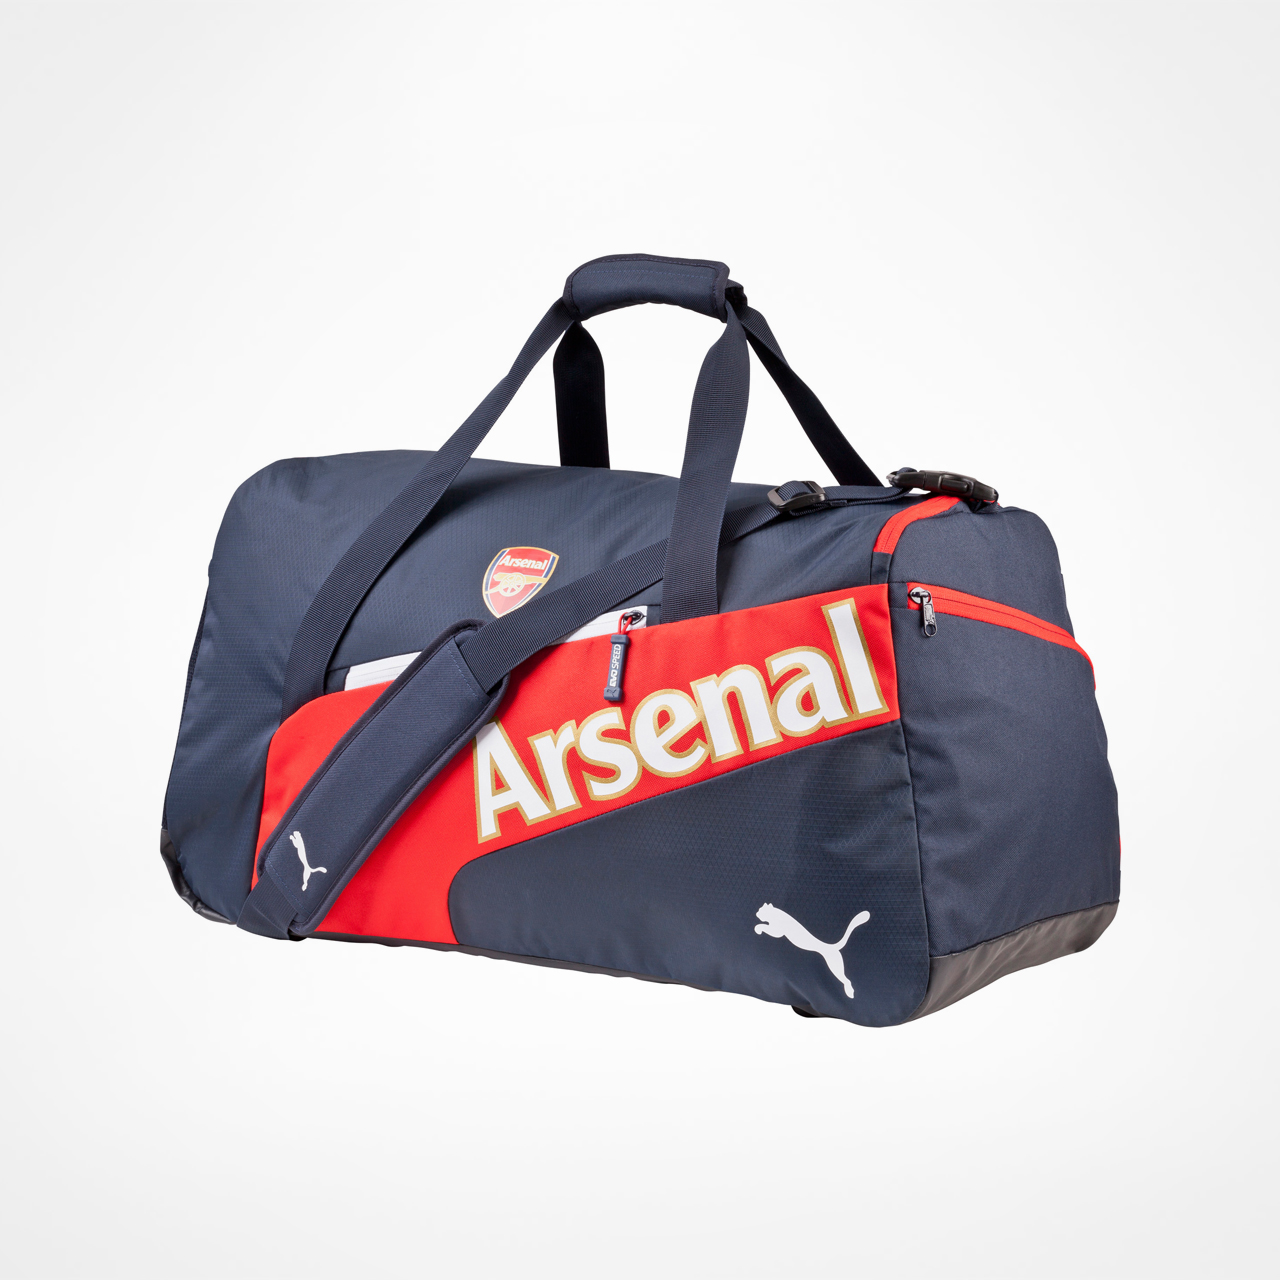 080afd4017 Arsenal Evospeed Medium Bag - SupportersPlace